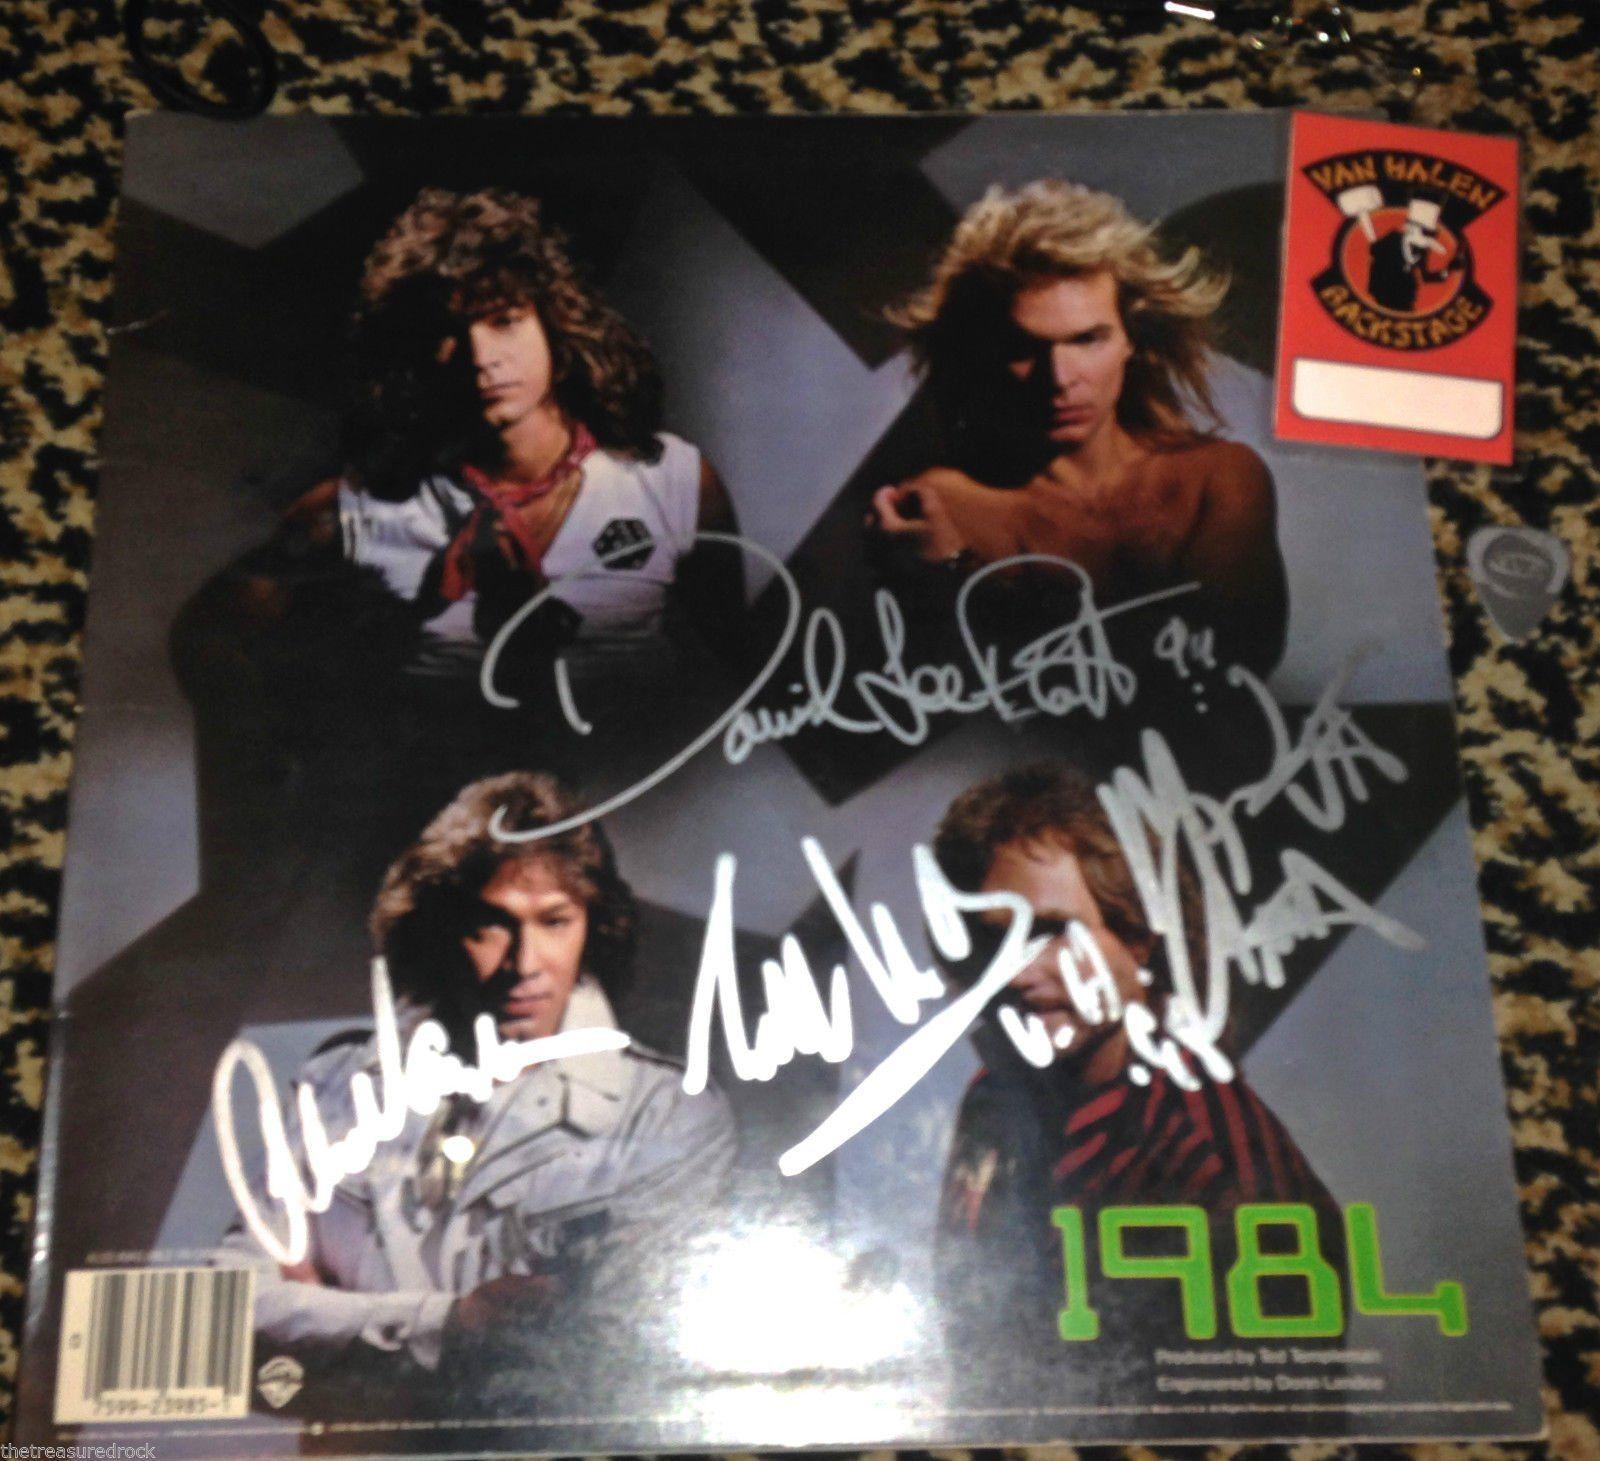 Van Halen 1984 Signed Autographed Lp Pass Record Eddie Alex Roth Anthony Psa Dna Want To Know More Click On The Image Affil Van Halen Halen Eddie Van Halen